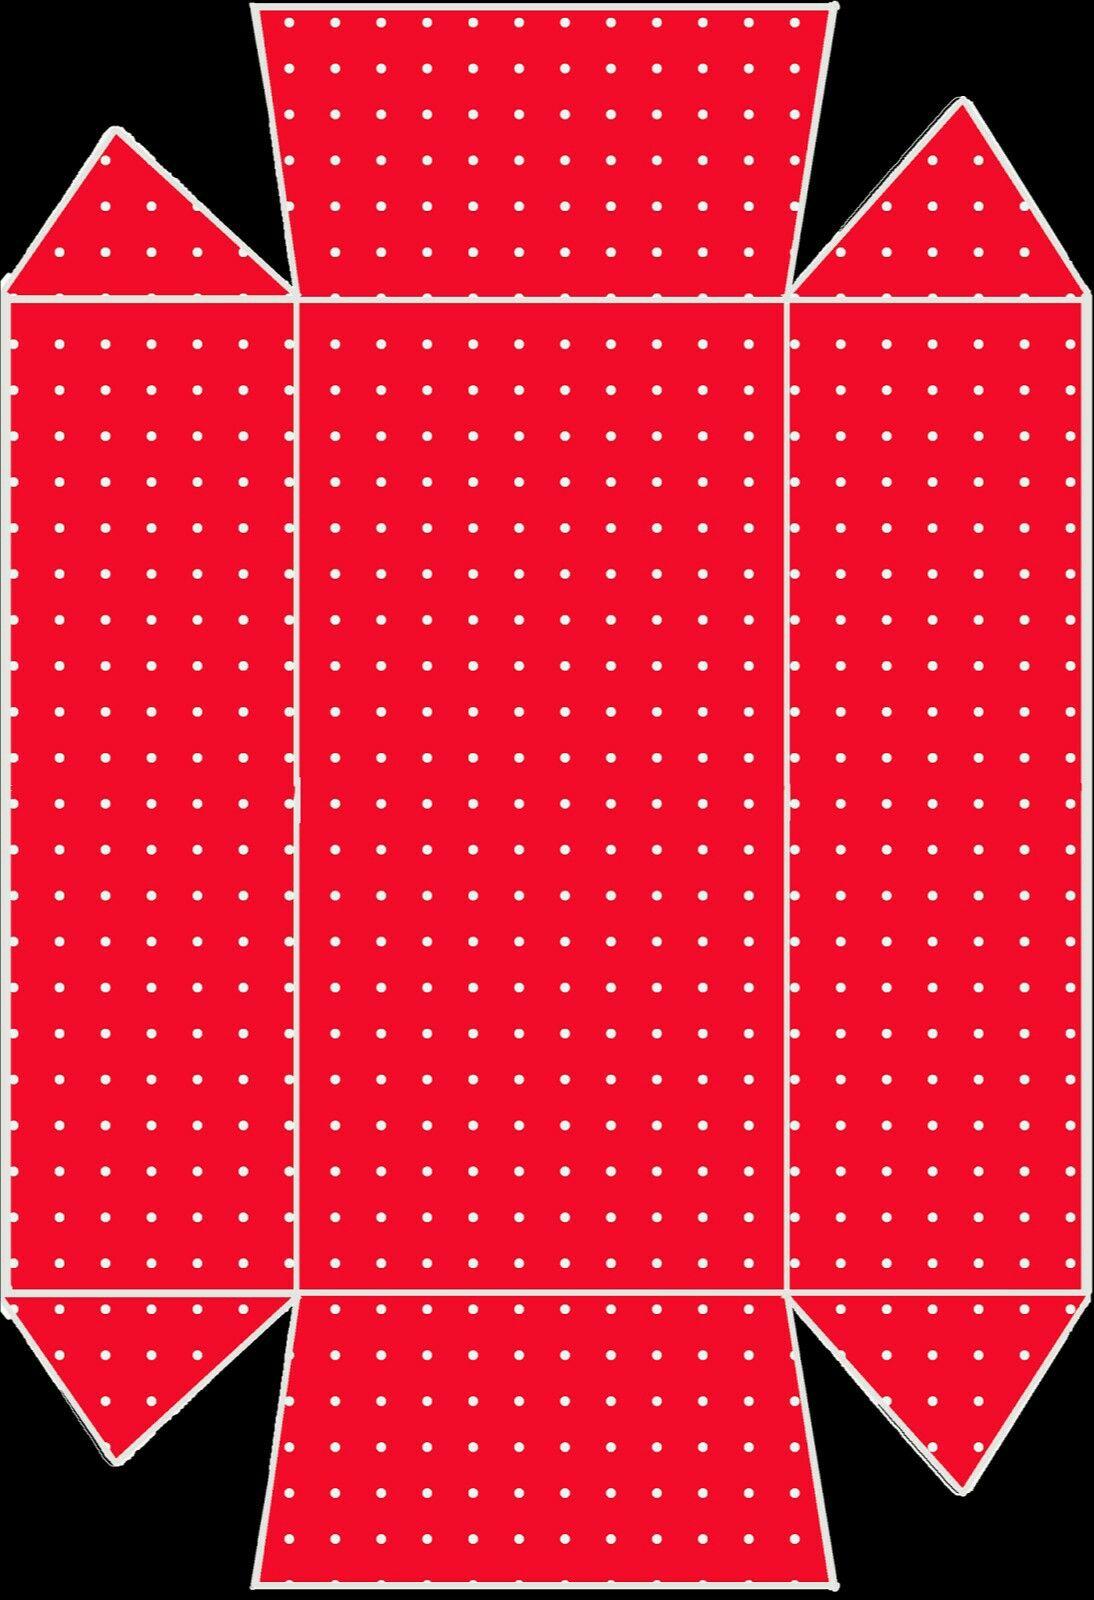 Bandeja roja